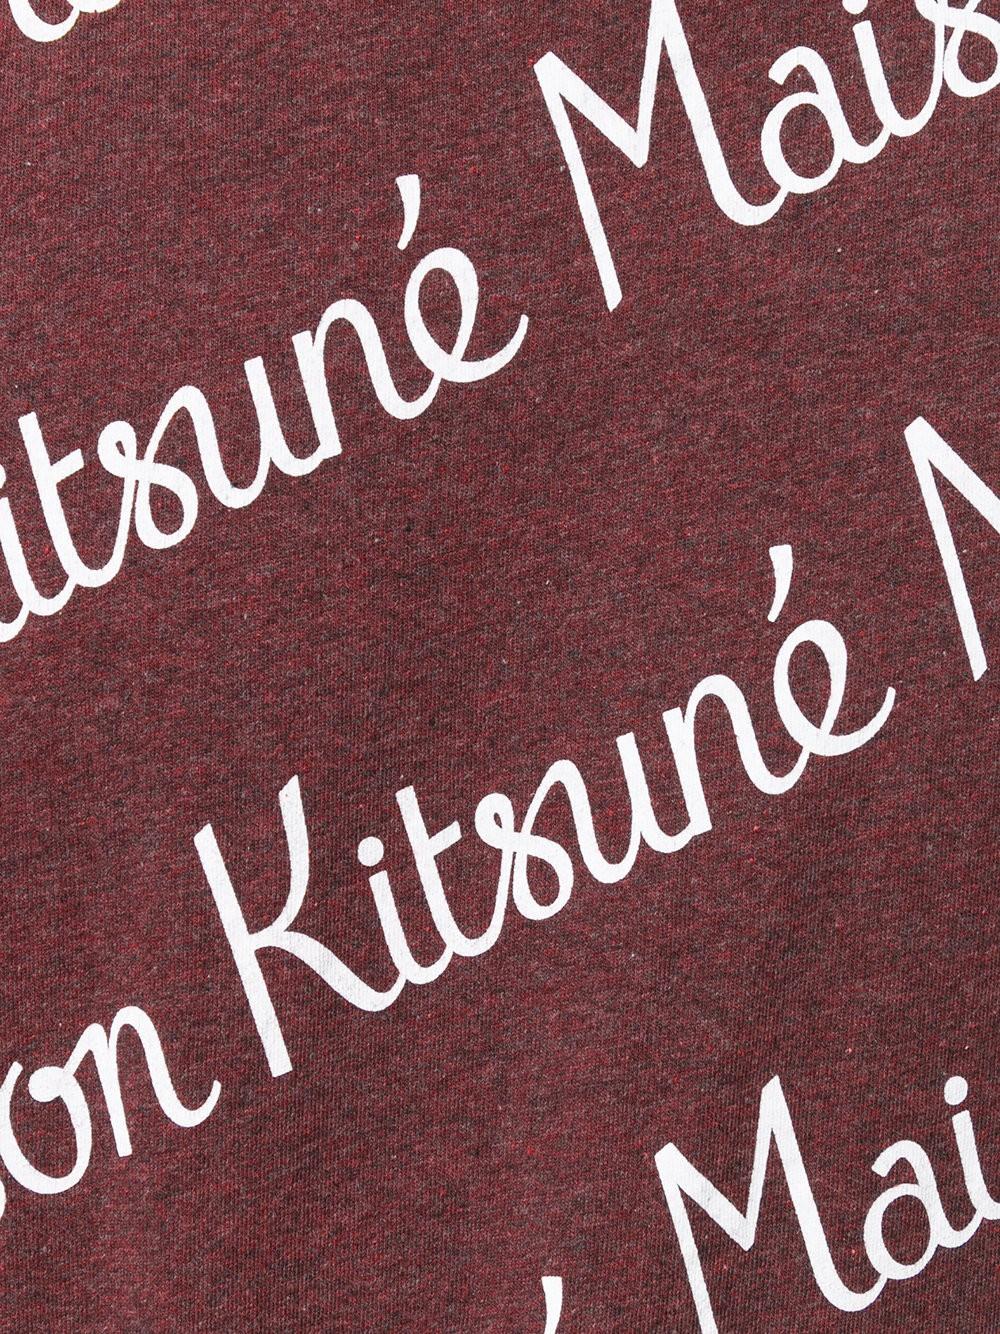 Camiseta de Maison Kitsuné